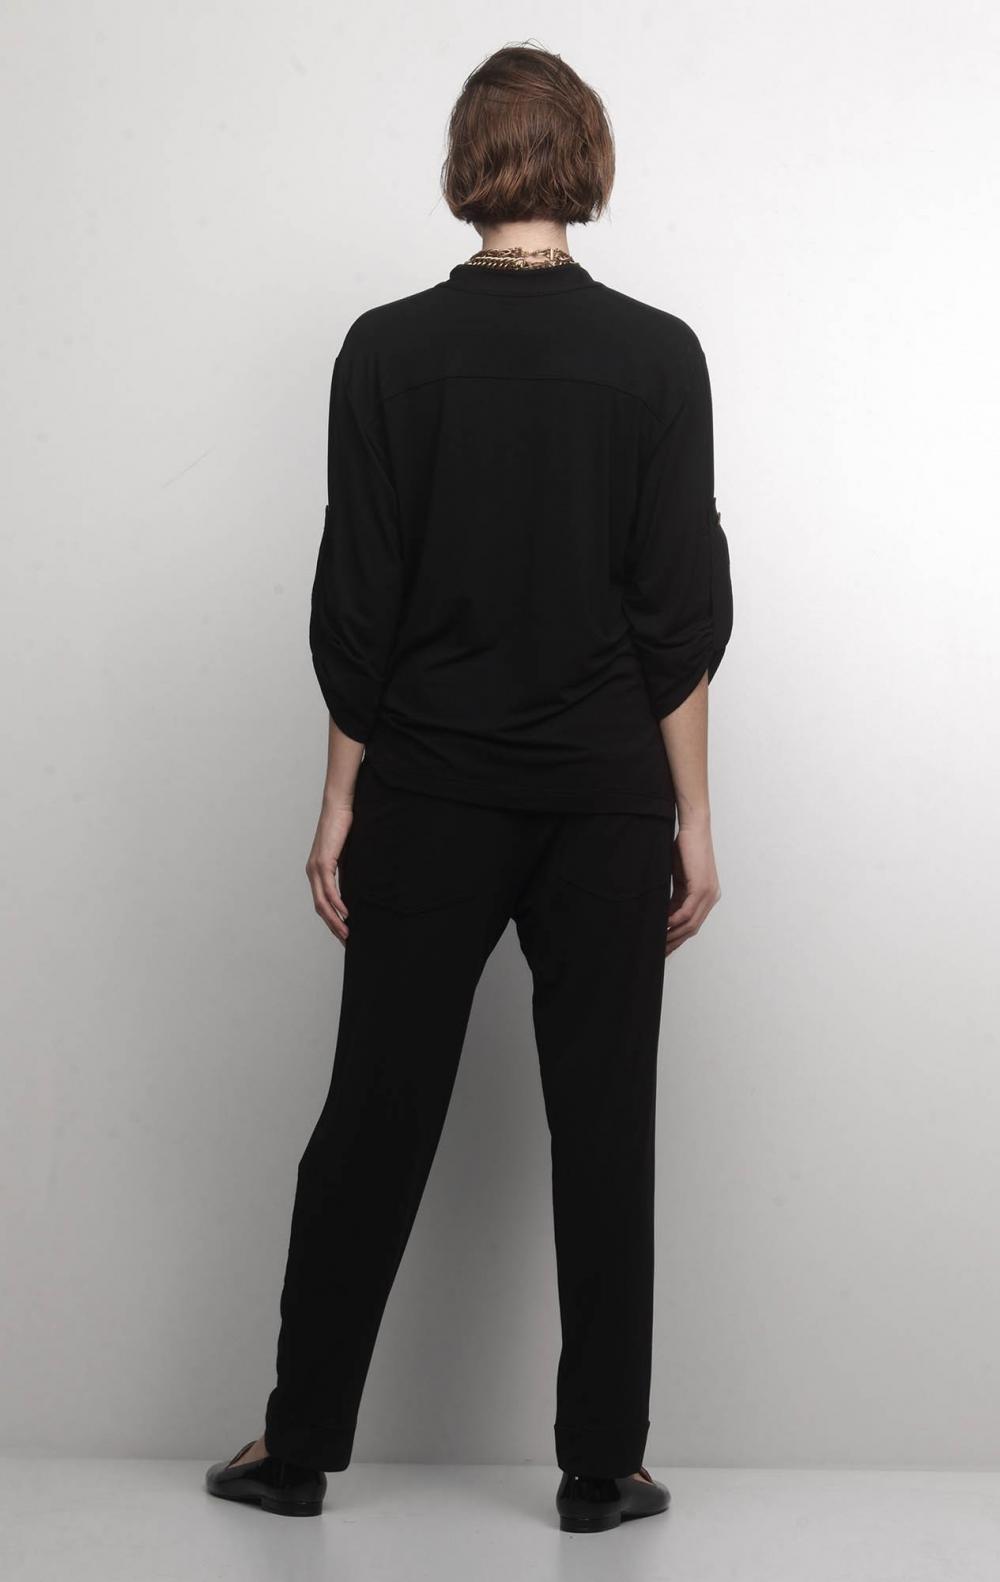 Conjunto Malha com Camisa Preto   - Foto 2